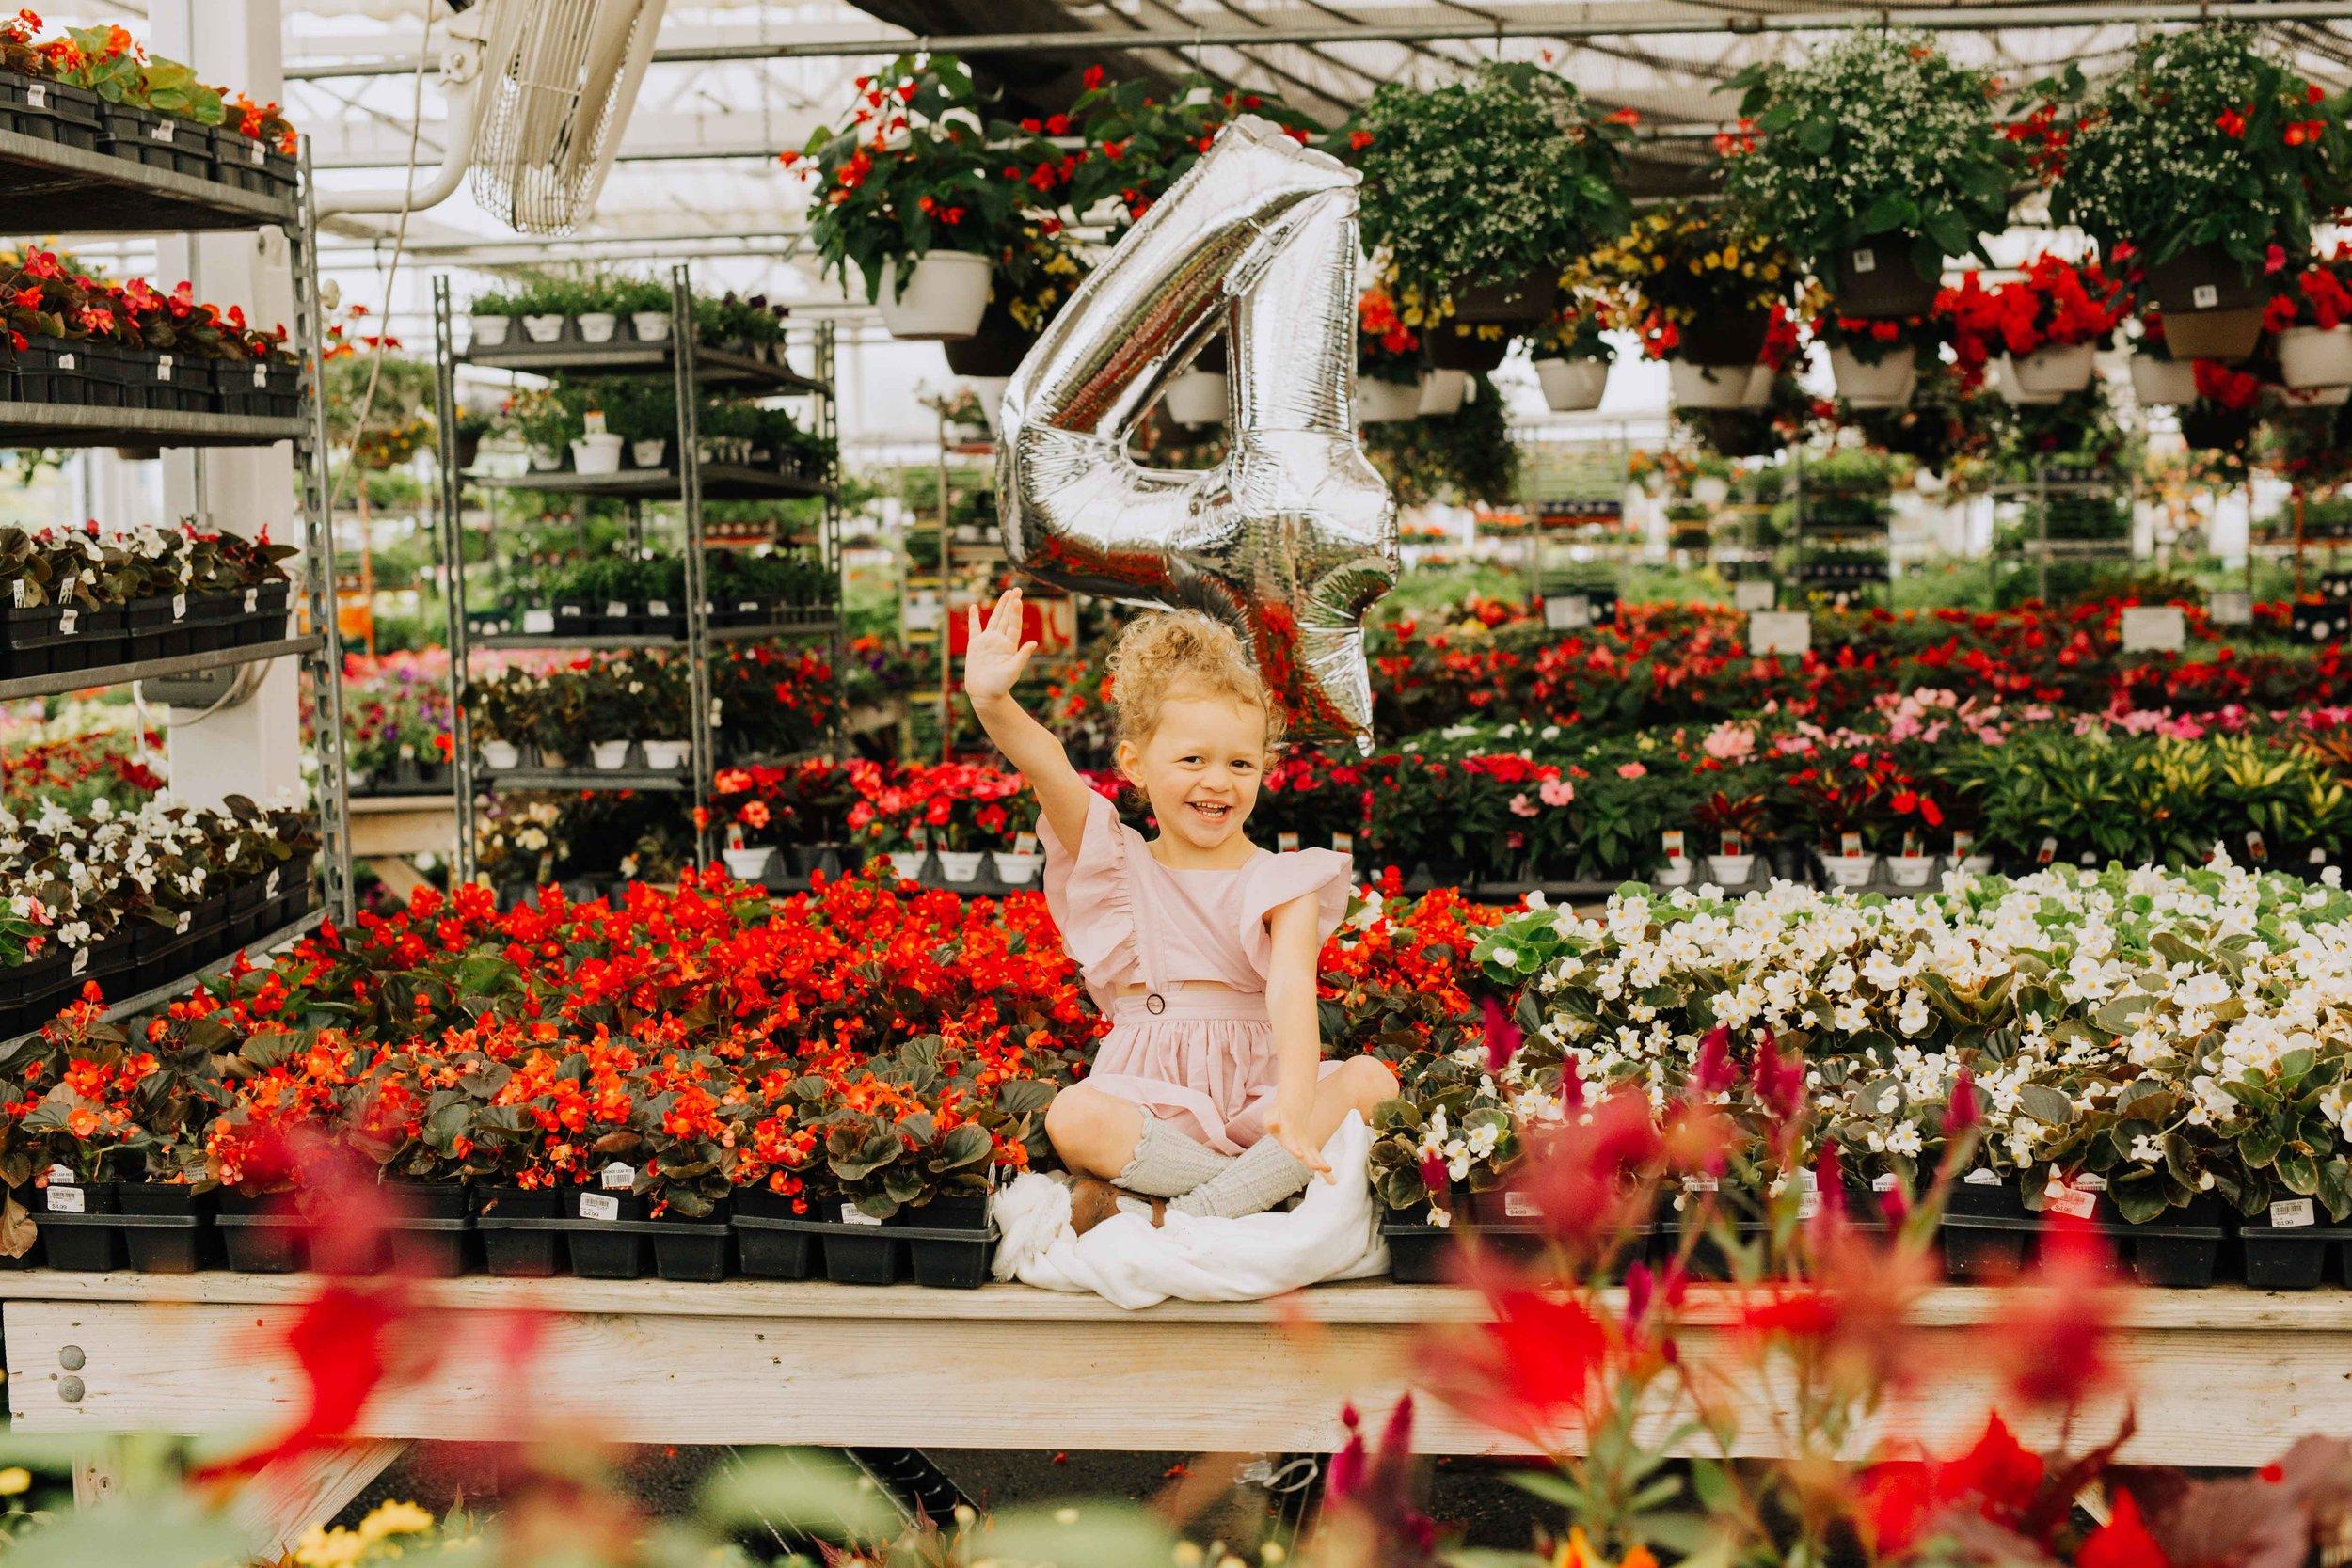 Merrifield-garden-greenhouse-indoor-Jacqueline-Waters-Photography-Red-dress-family- (264).jpg